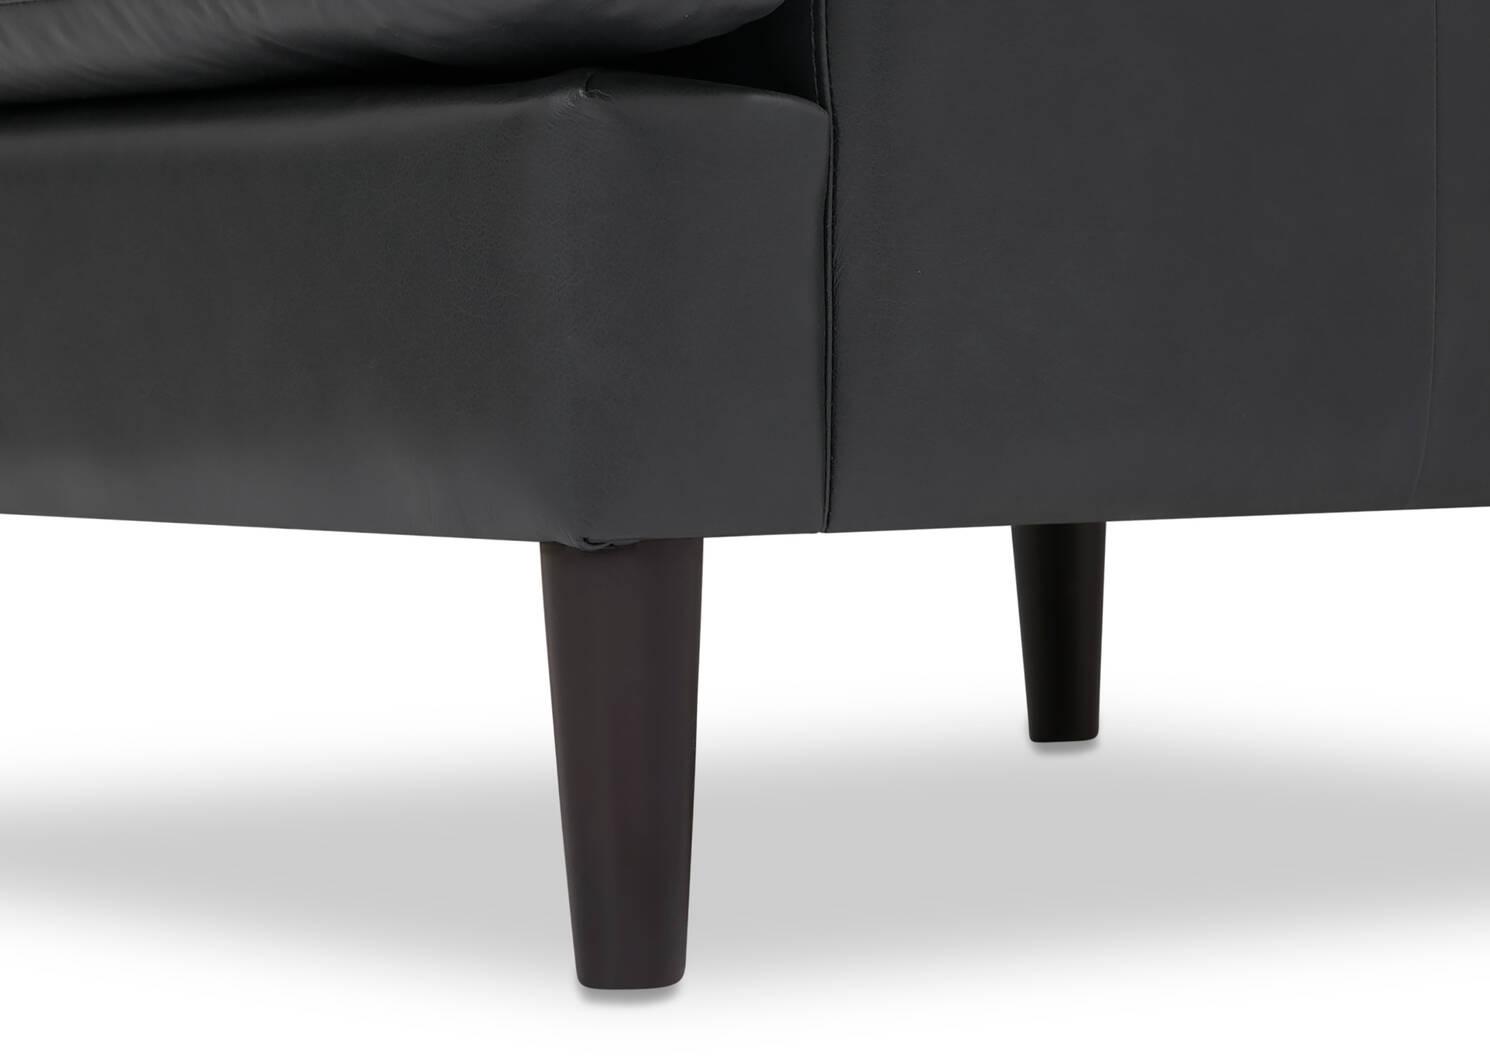 Fauteuil en cuir Savoy -Jett anthracite